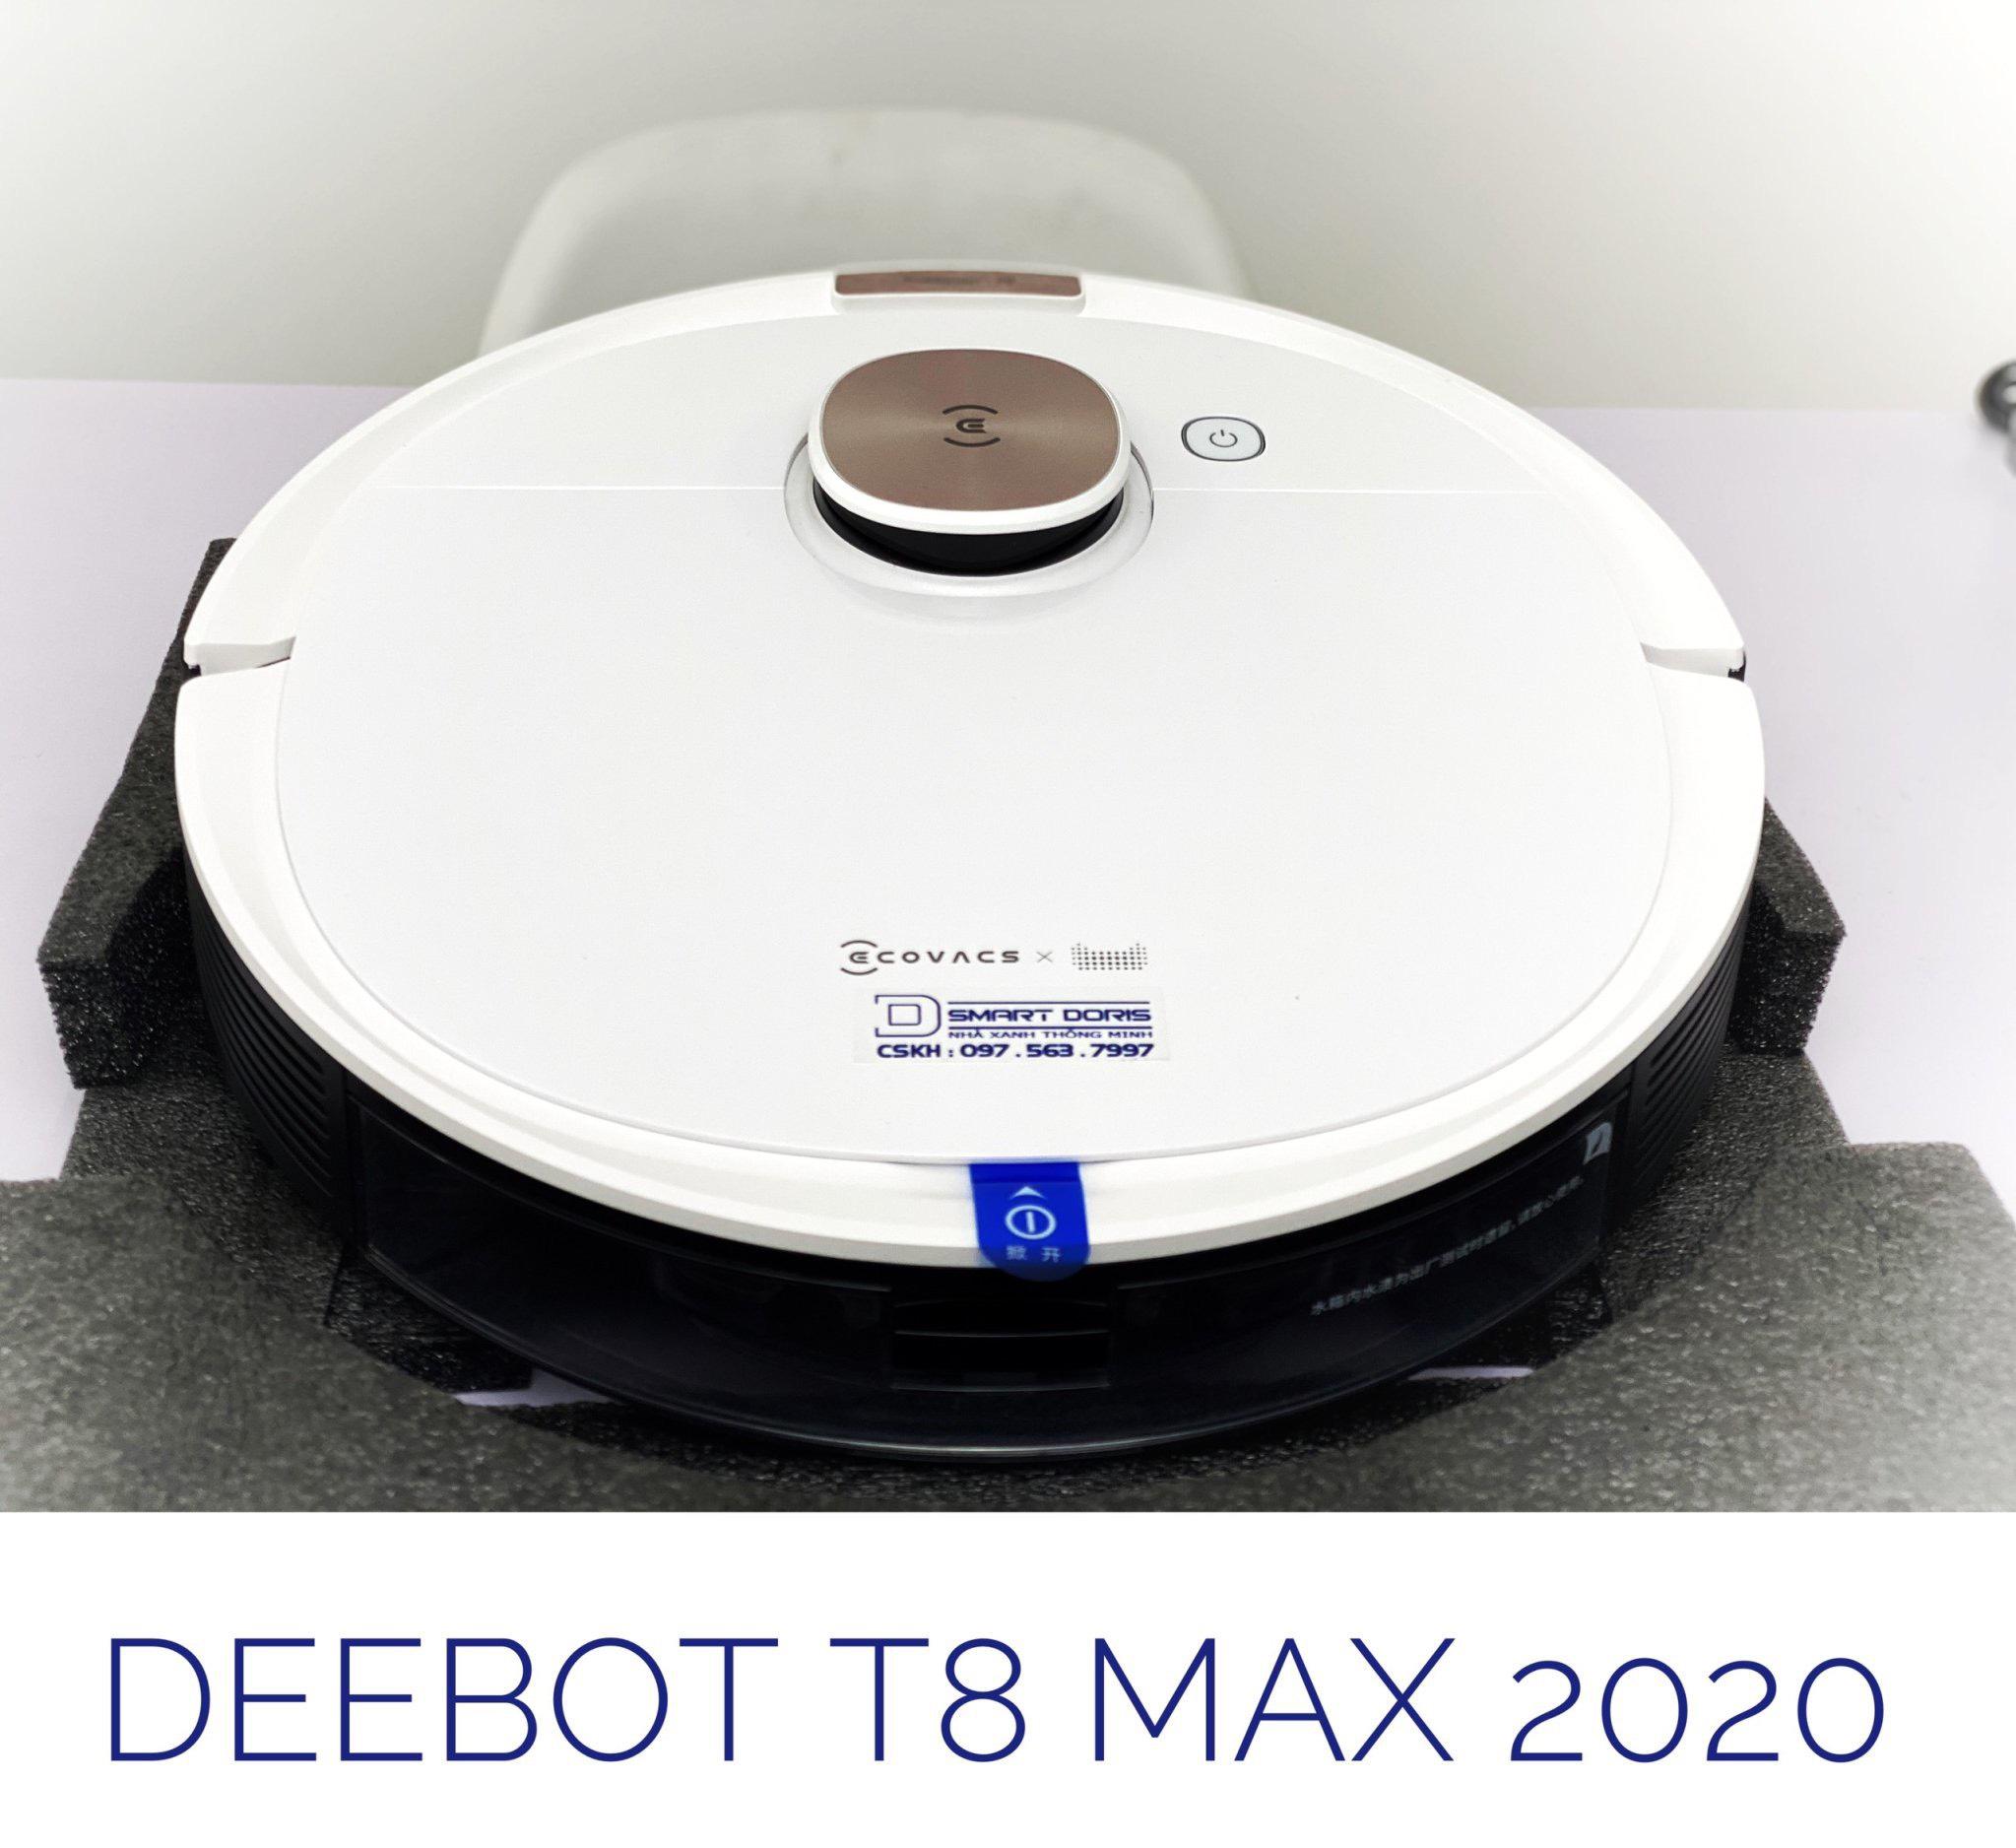 DEEBOT T8 MAX ECOVACS